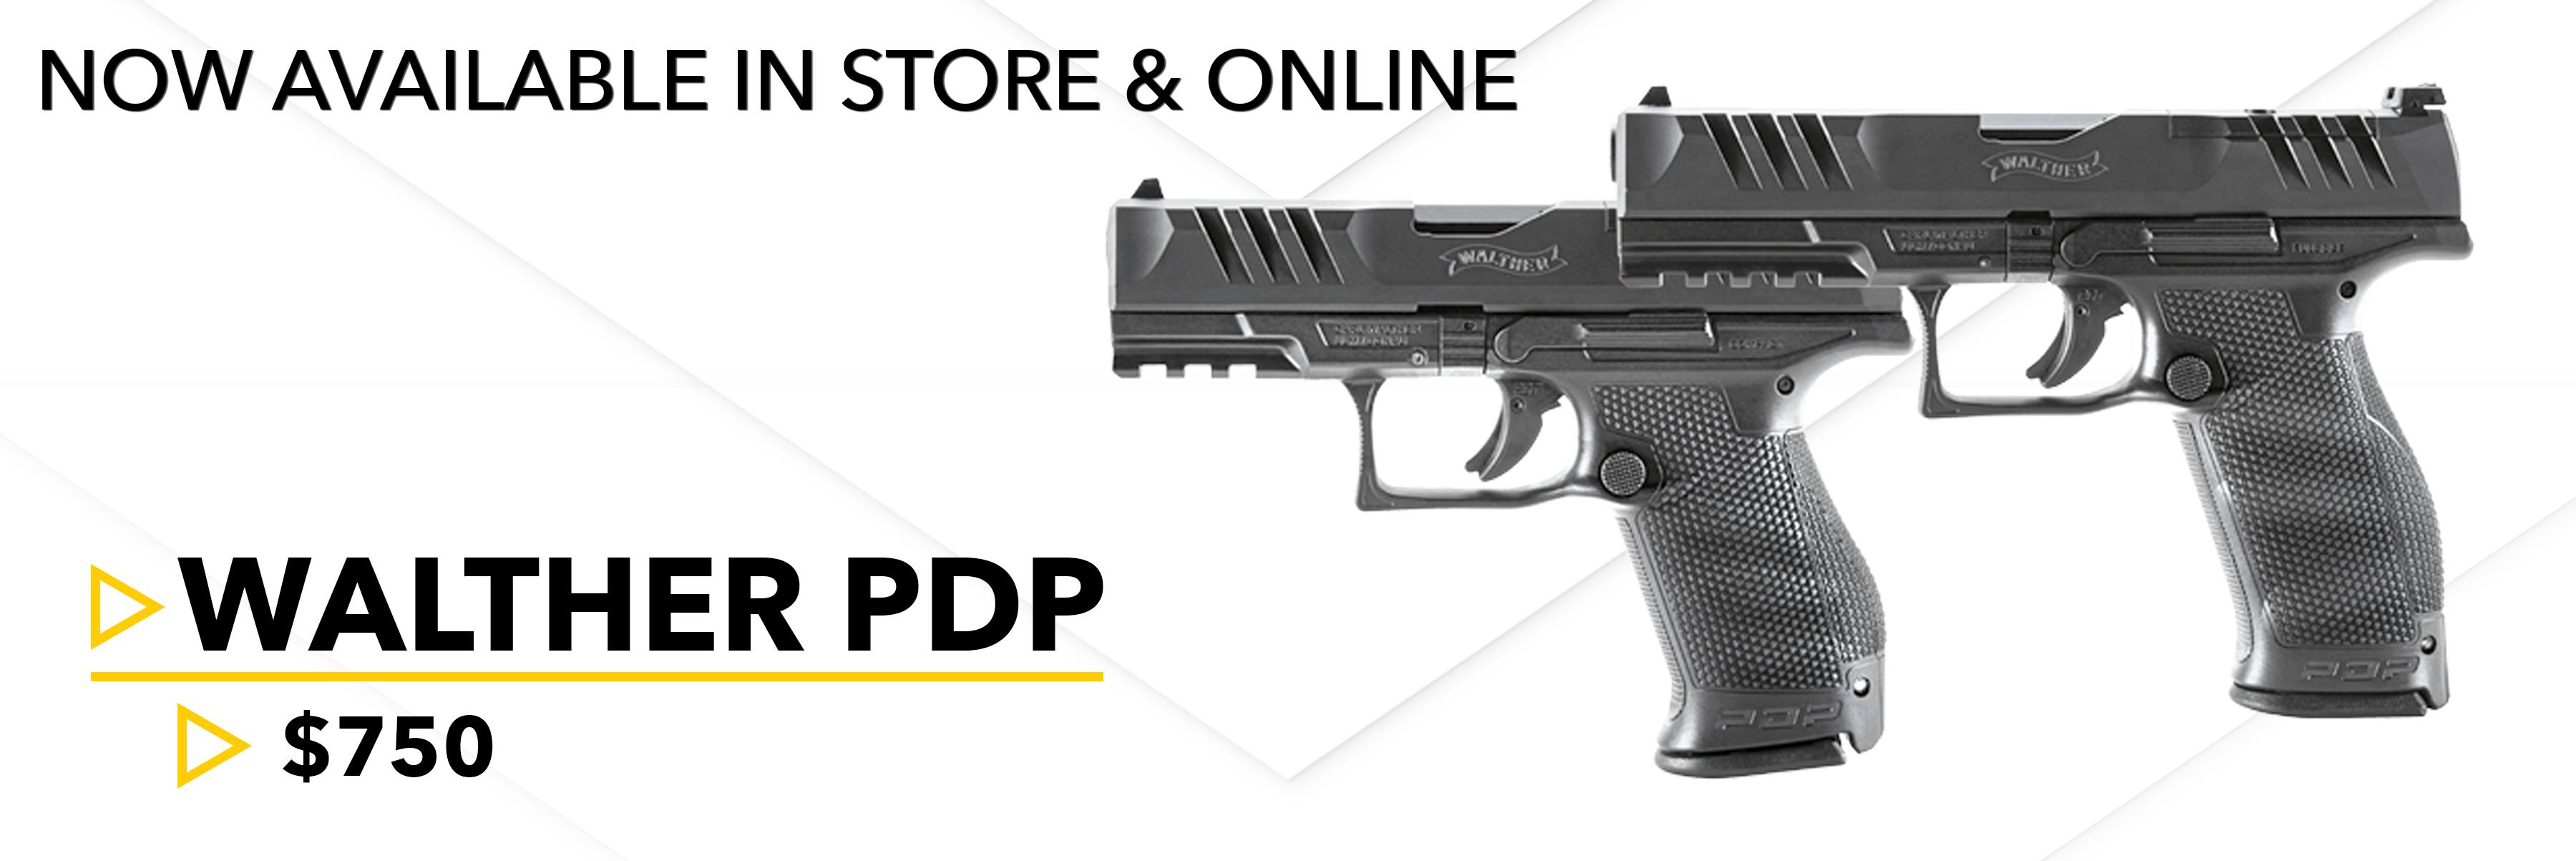 https://shop.rtsponline.com/products/handguns-walther-2858126-723364220289-4646